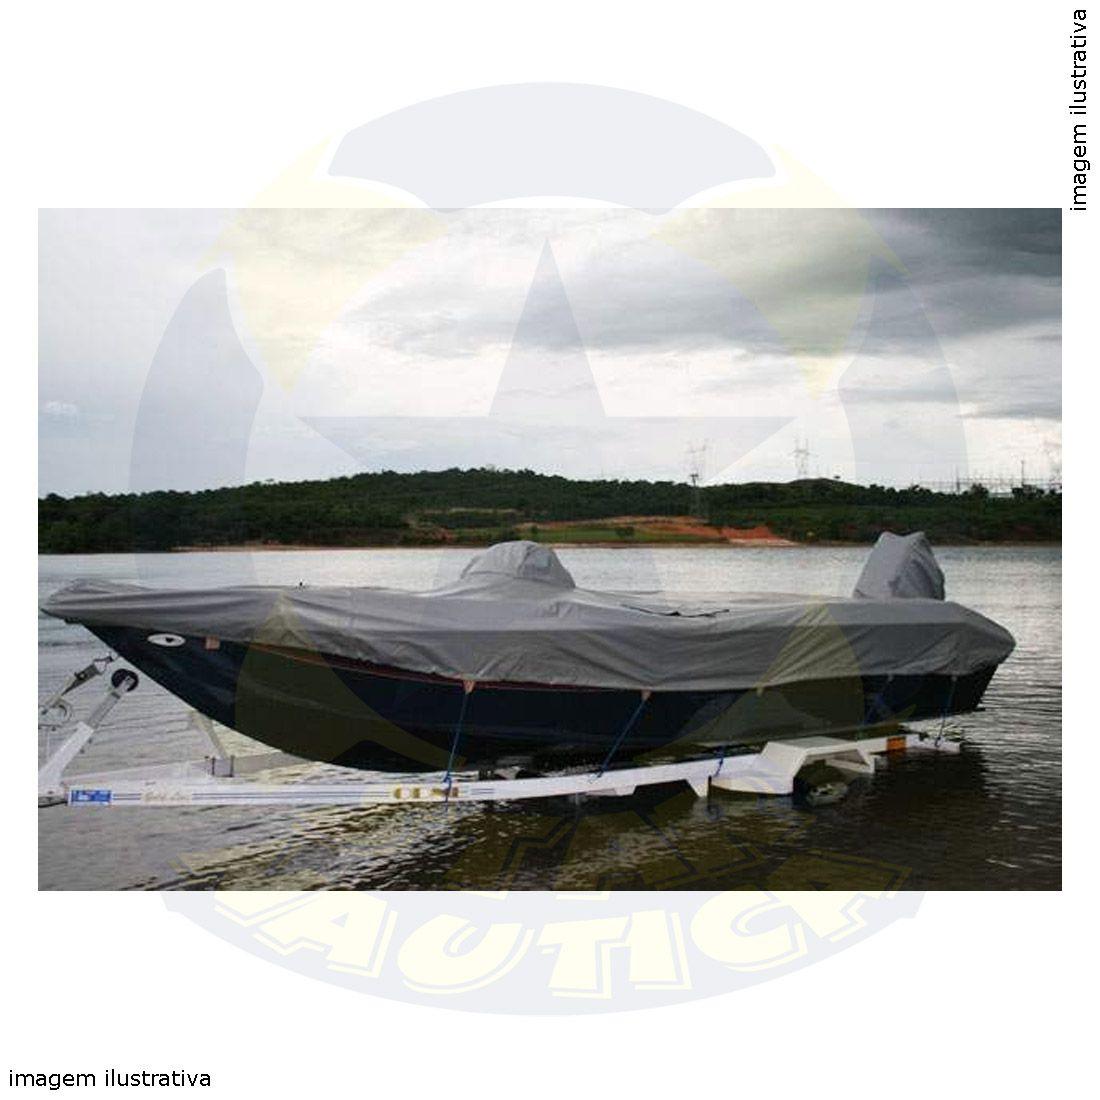 Capa Lona de Cobertura Lancha Apache 18 Pés Rionáutica Lona Vinílica